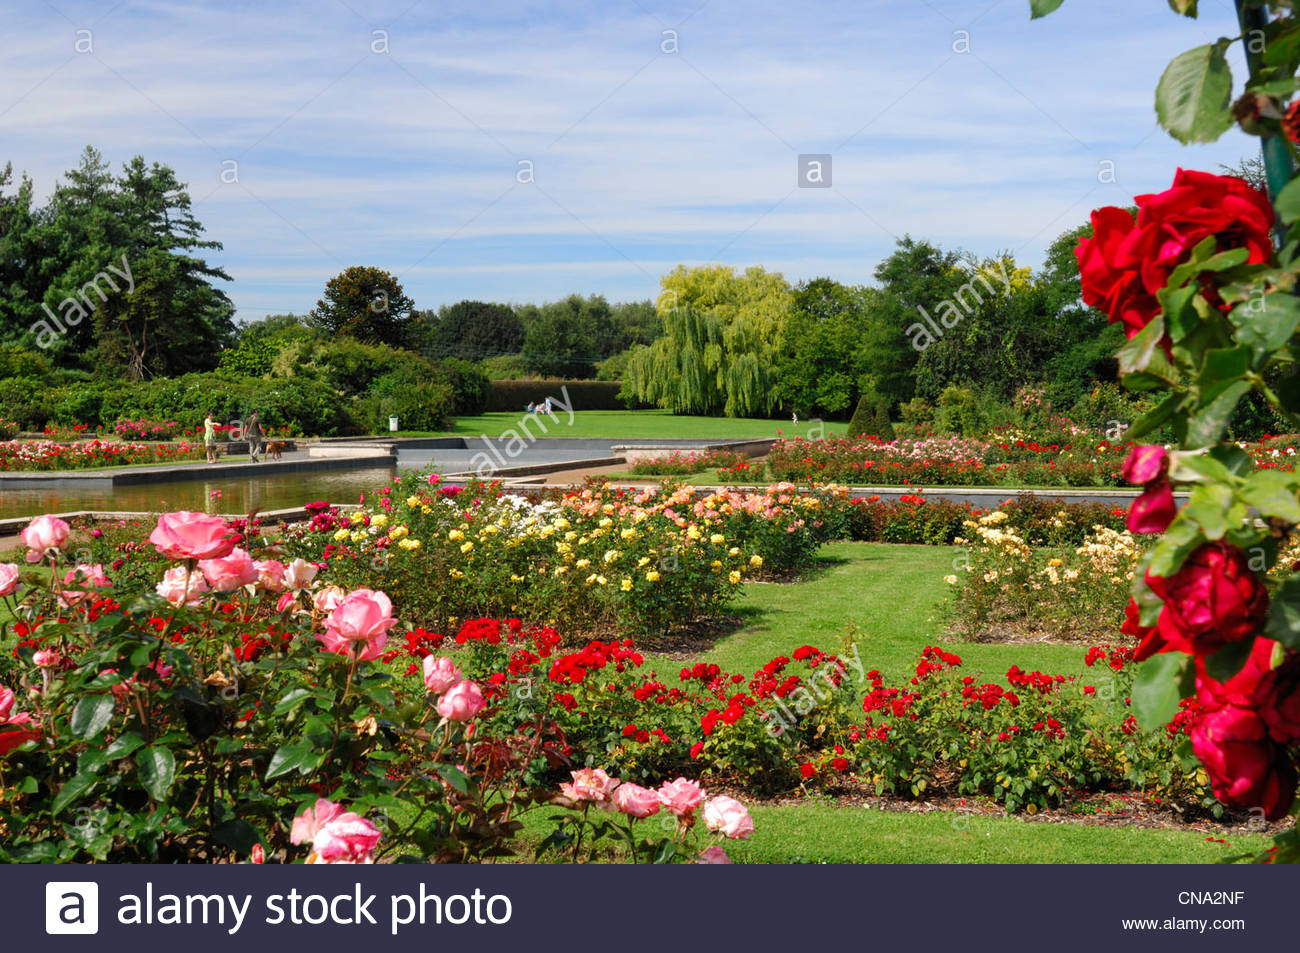 Jardin Des Plantes De Lille Best Of nord Dep Stock S & nord Dep Stock Page 6 Alamy